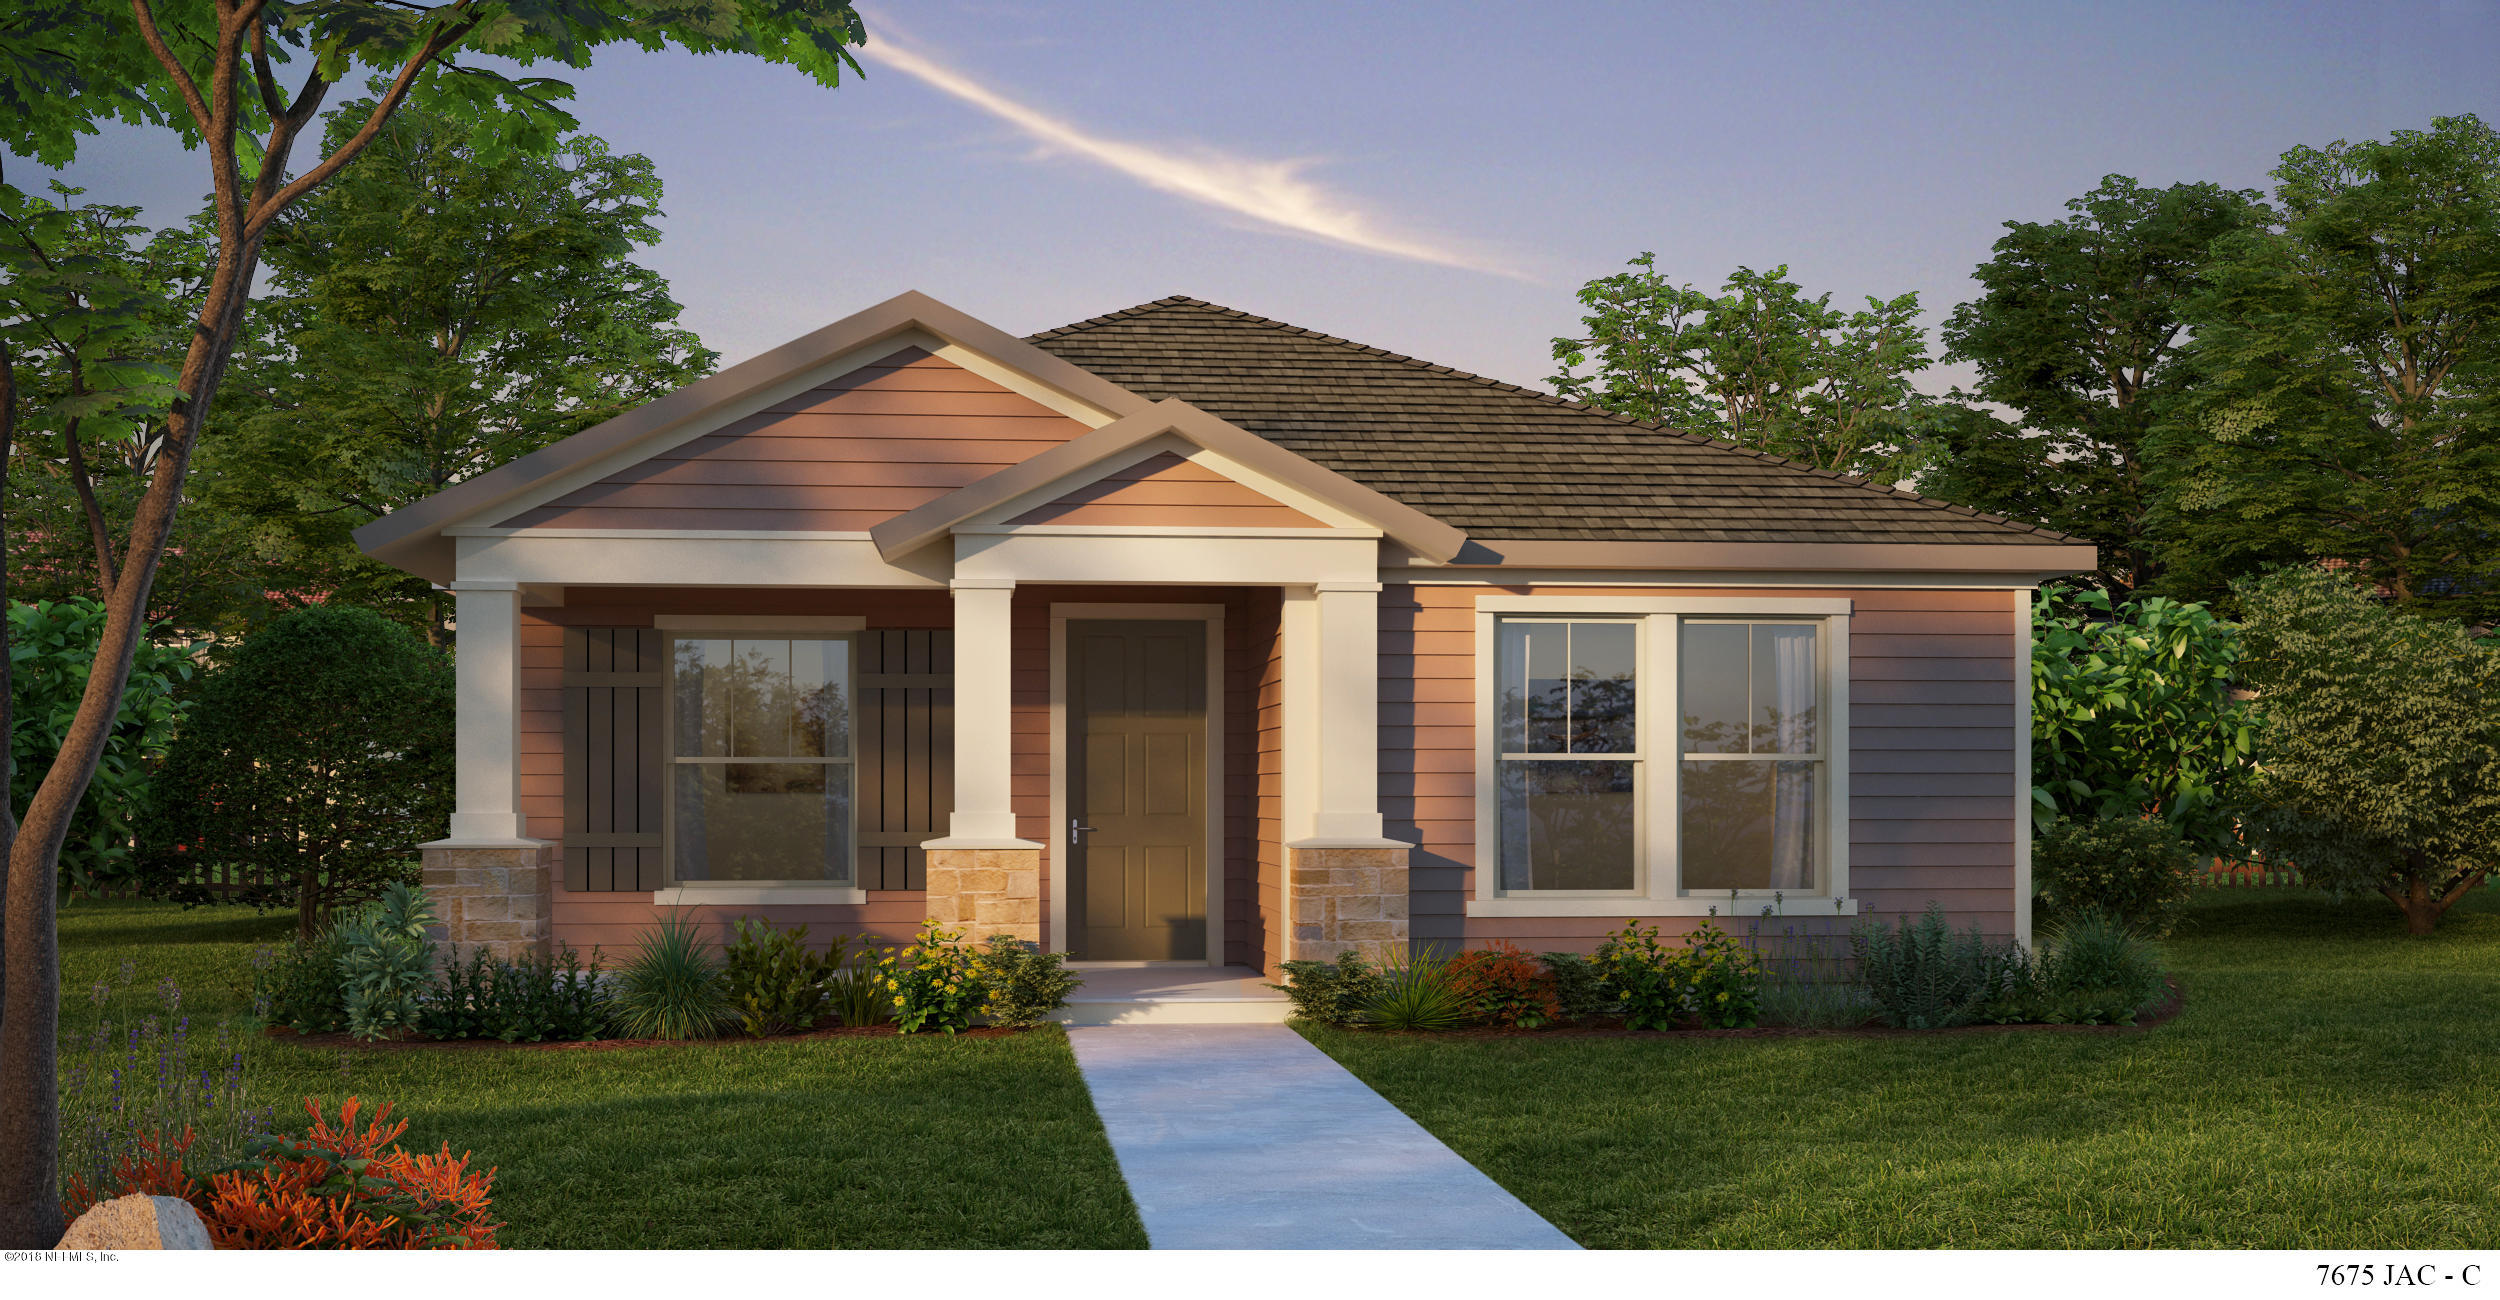 185 DALTON, ST AUGUSTINE, FLORIDA 32092, 3 Bedrooms Bedrooms, ,2 BathroomsBathrooms,Residential - single family,For sale,DALTON,947872